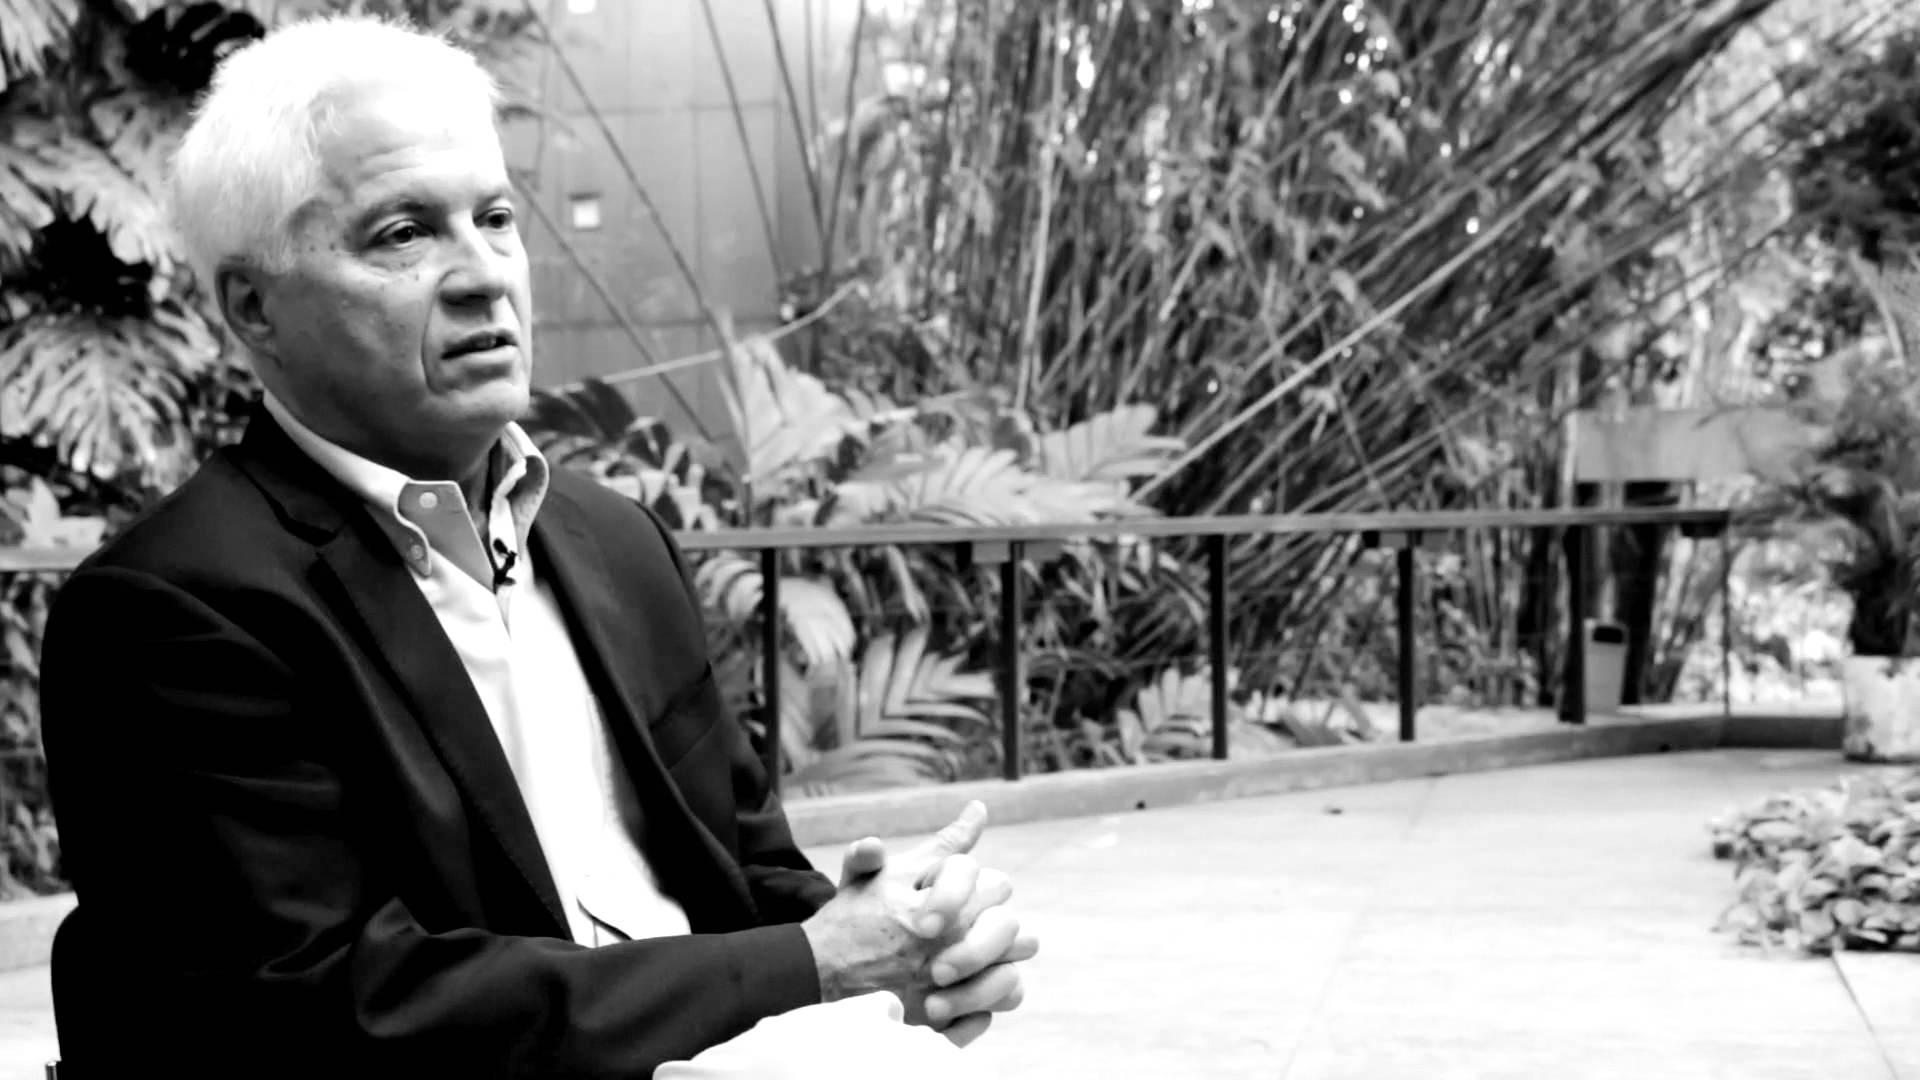 Paulo Gurgel Valente Remembers His Mother, Clarice Lispector